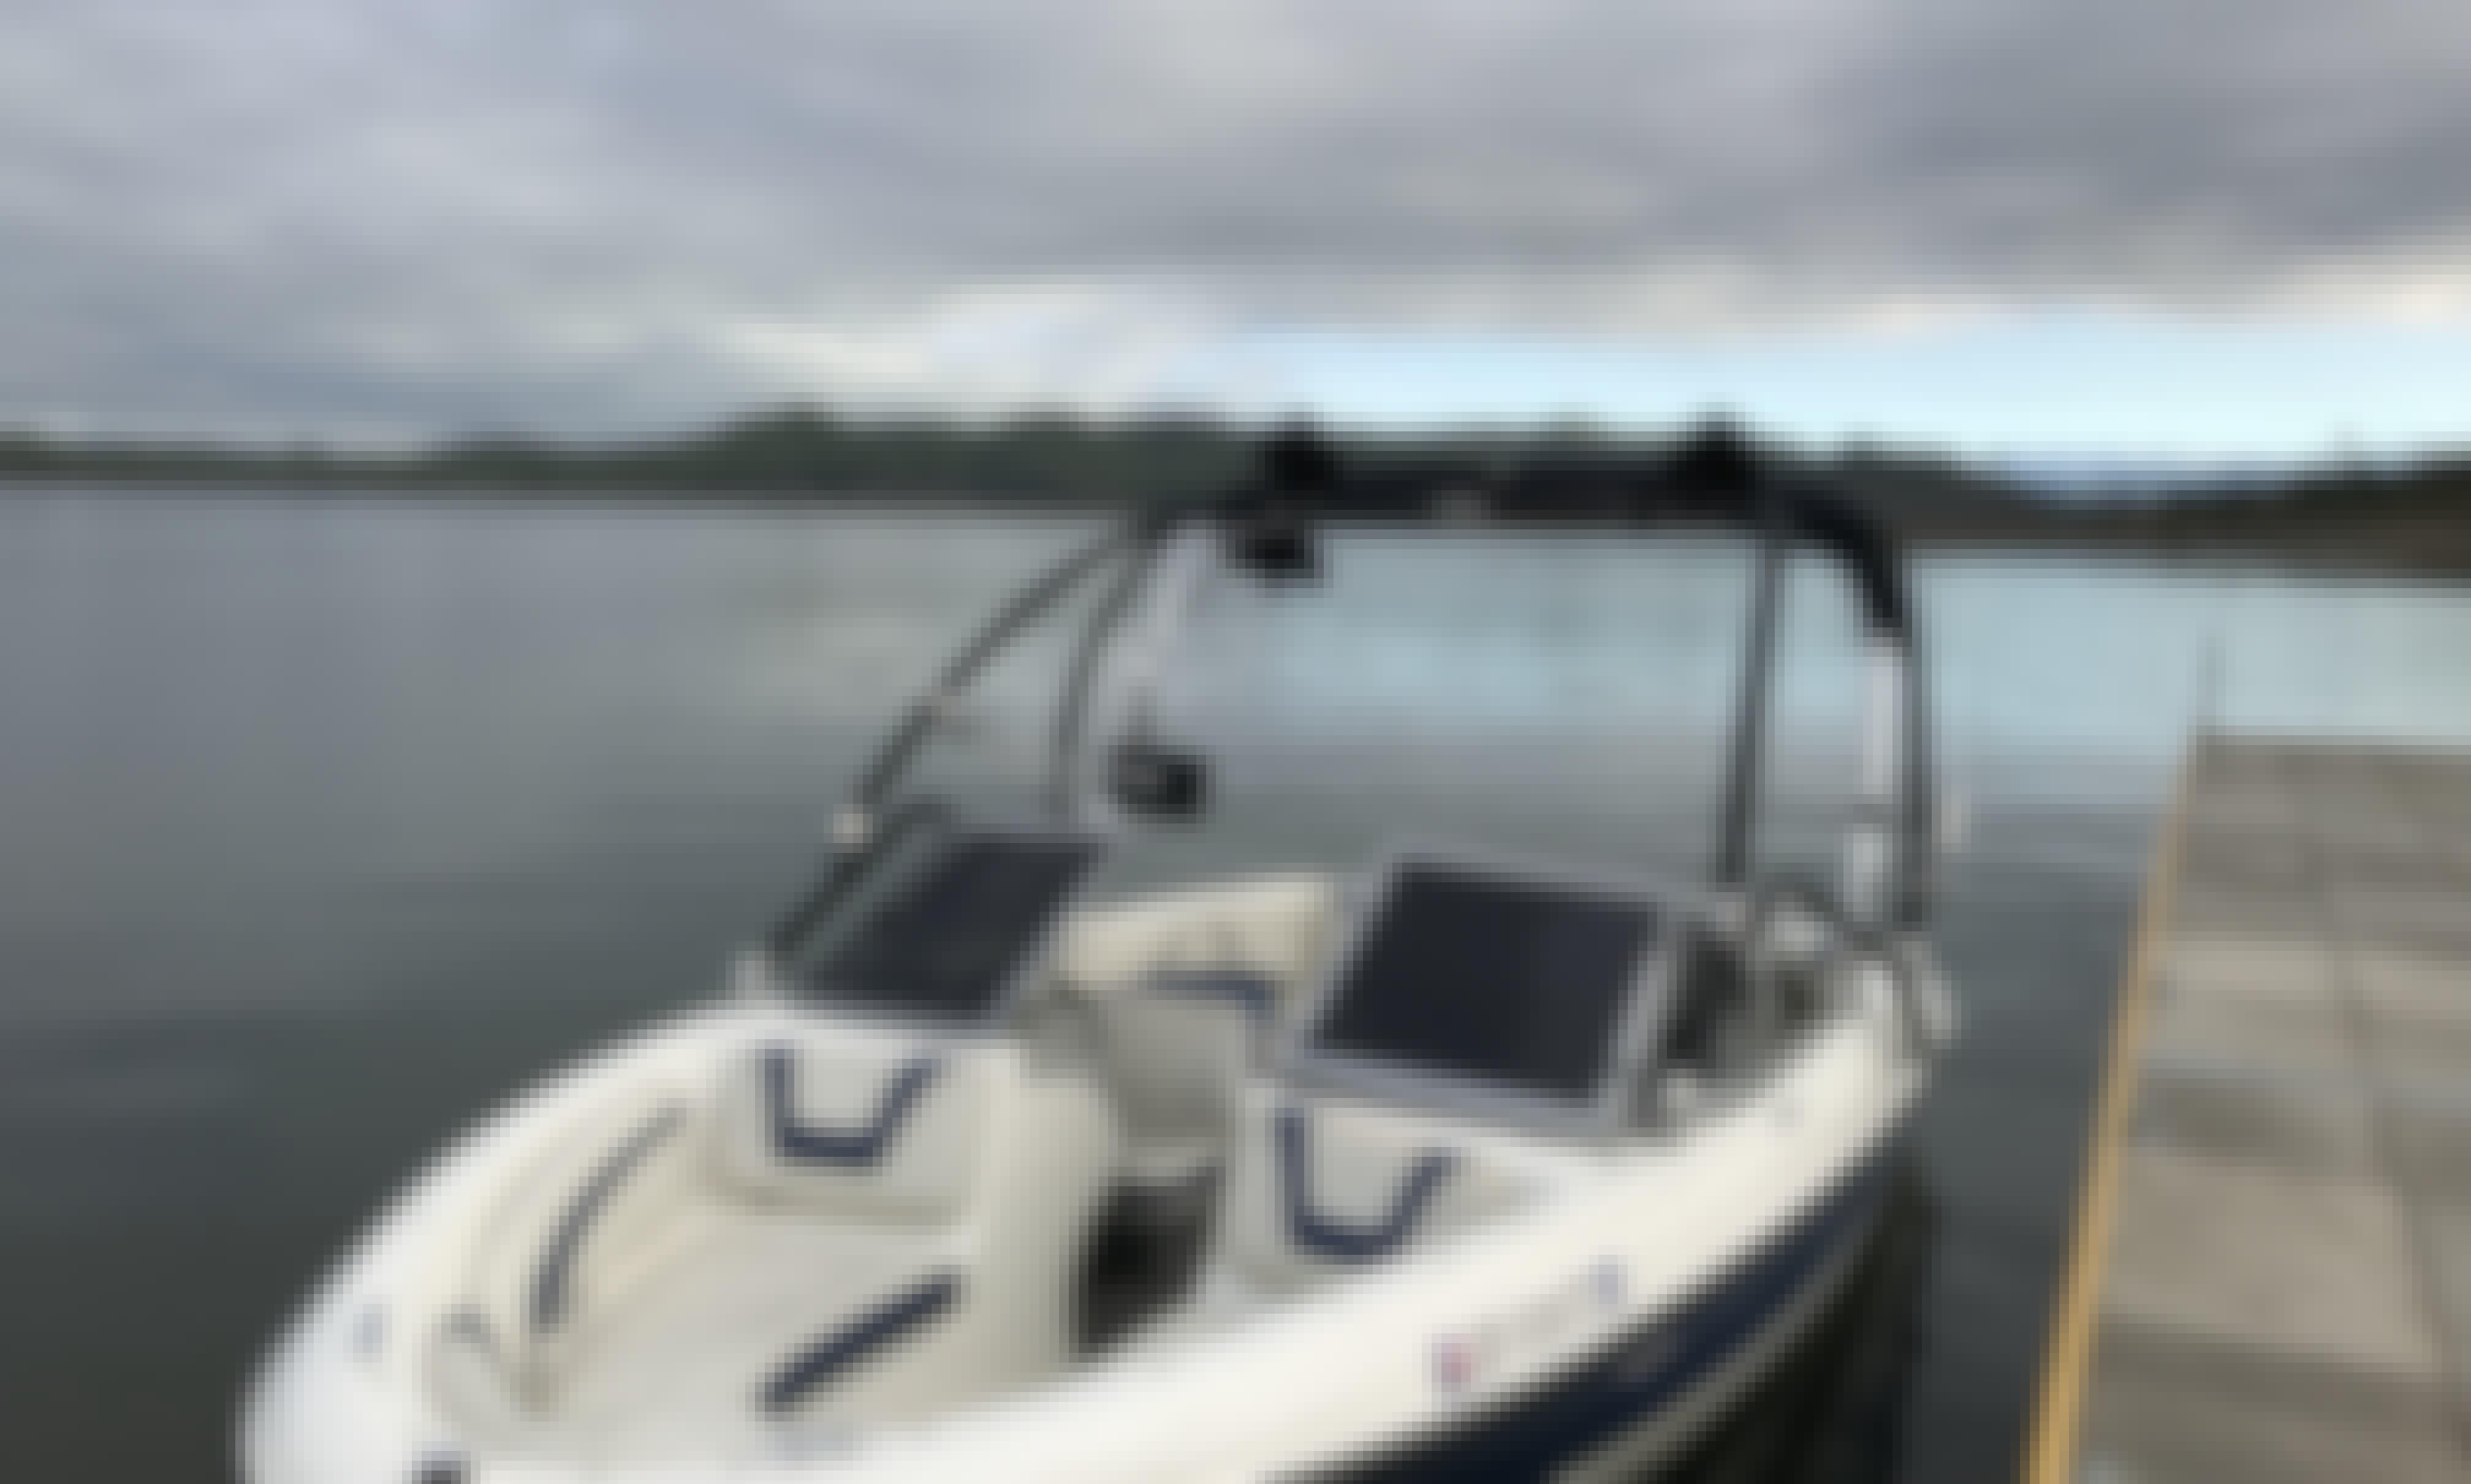 7 Passenger Boat Rental in Pine Flat Lake, California